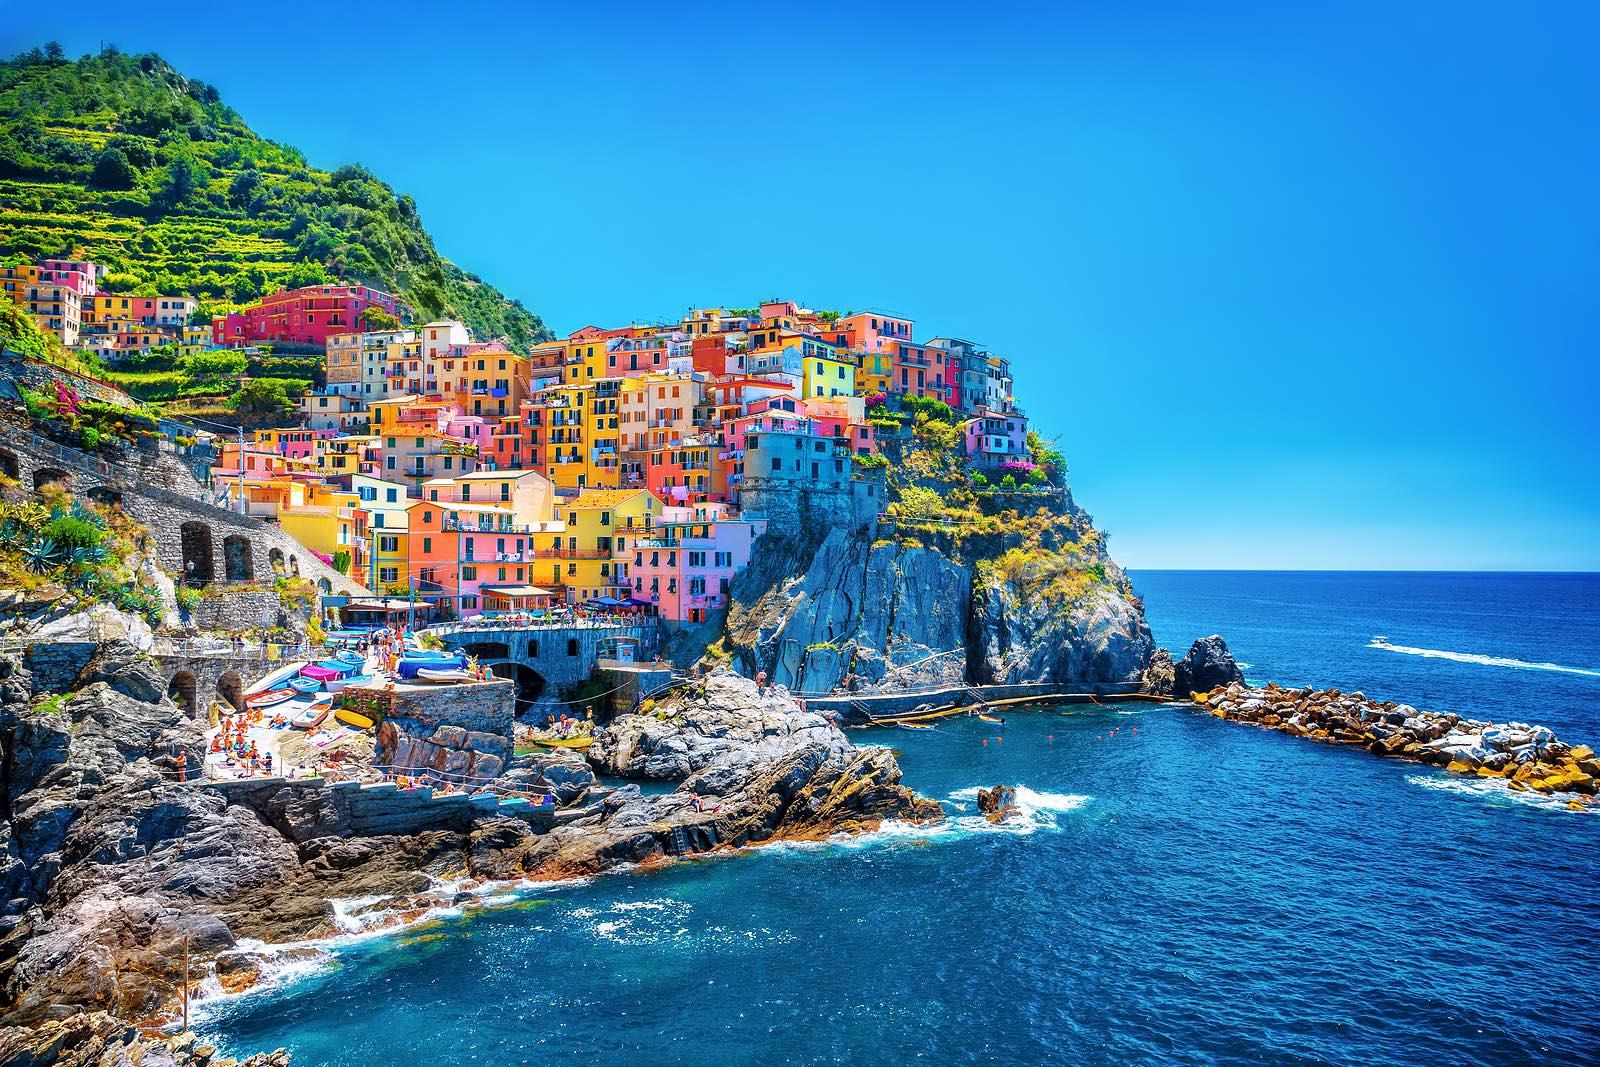 Beautiful colorful cityscape on the mountains over Mediterranean sea, Europe, Cinque Terre, traditio